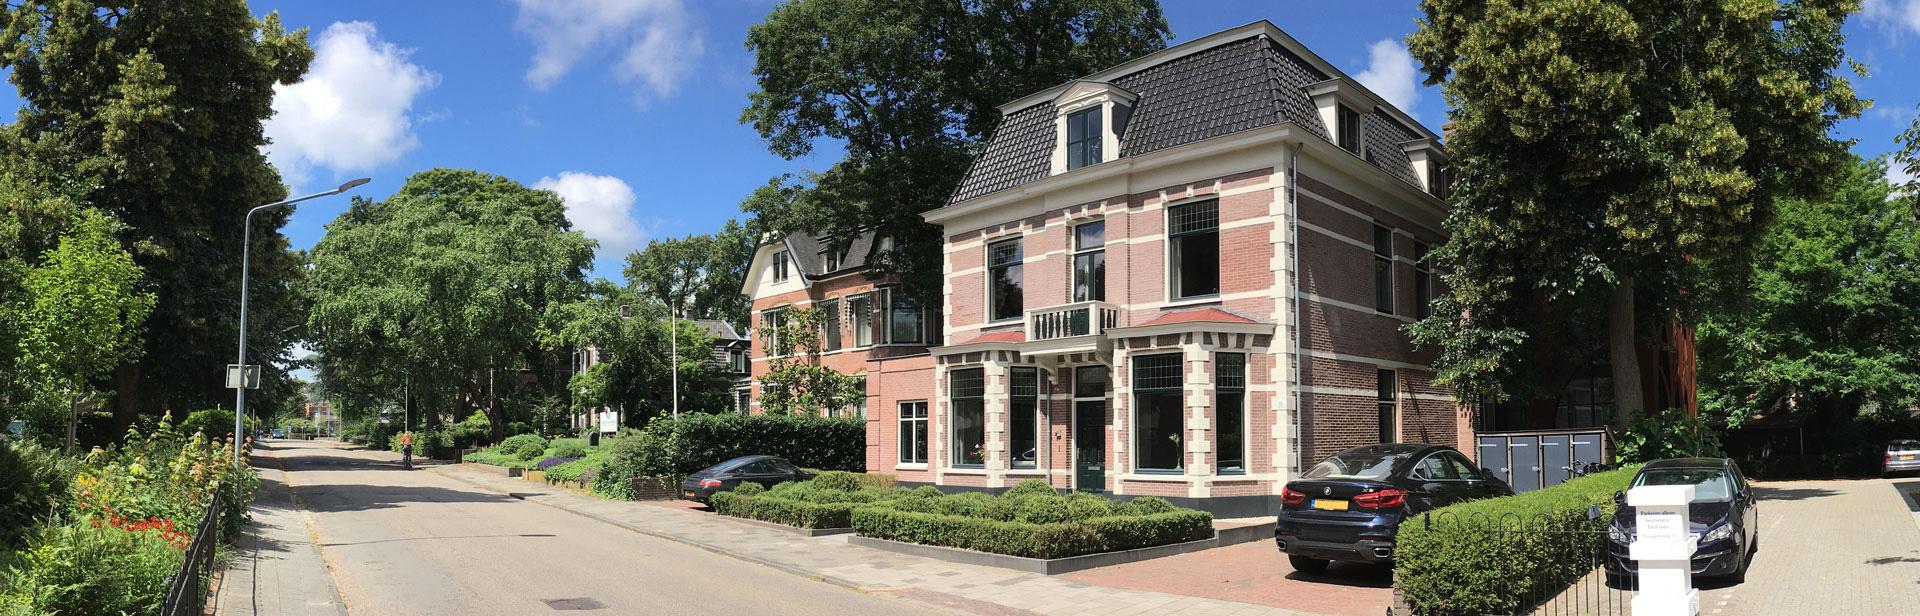 ArtVenture professioneel communicatiebureau Hilversum